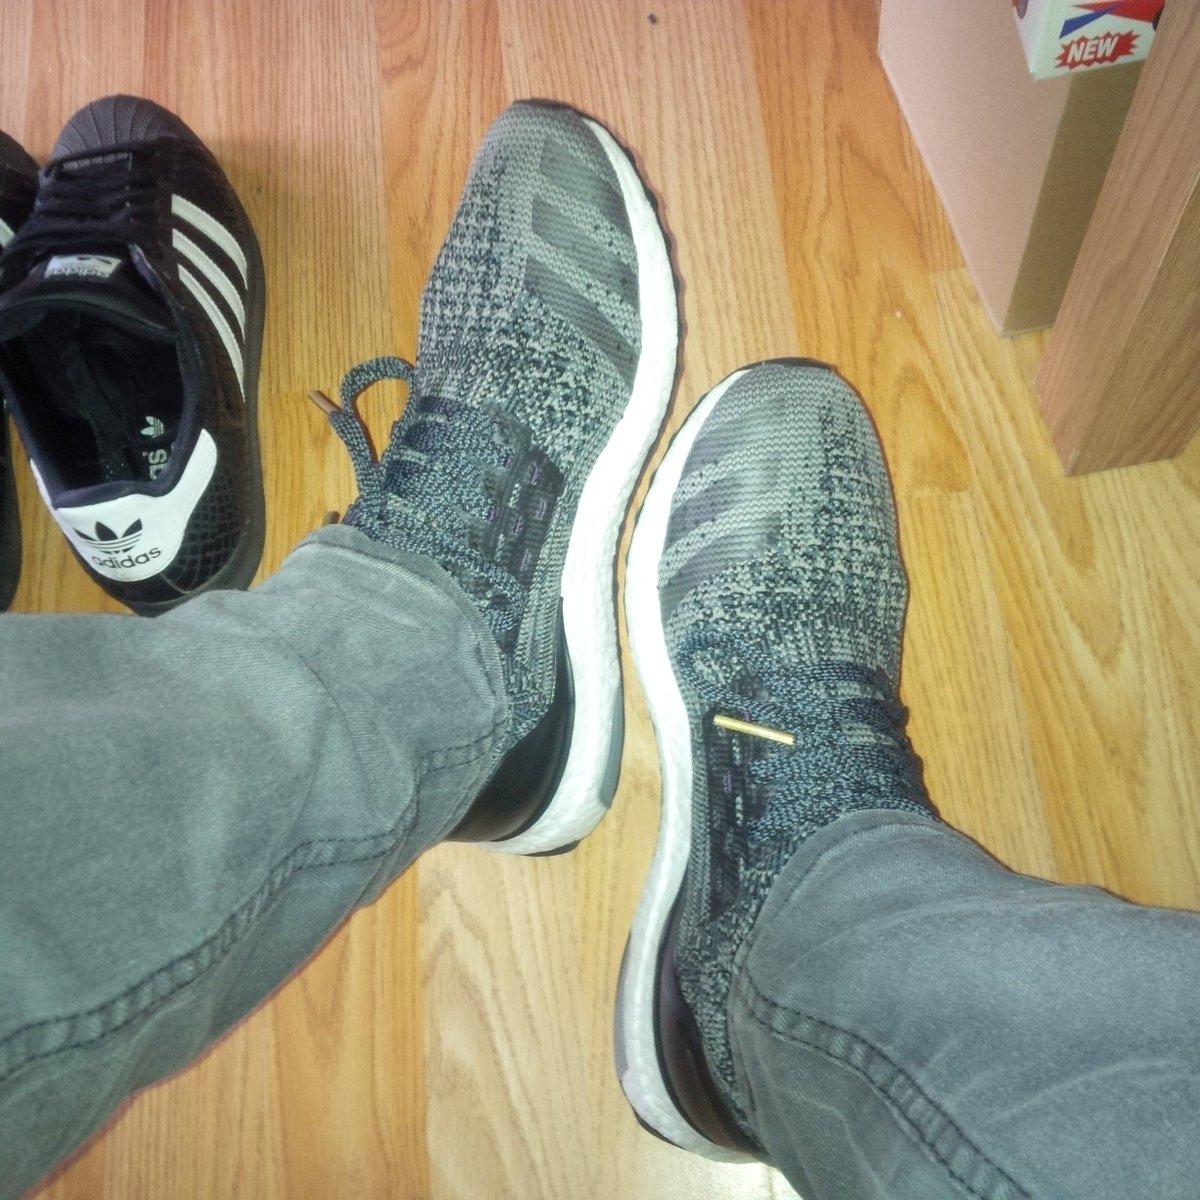 3810c65c0da92  Sneakerpedia Buzzin my  adidasUltraBoostUncaged arrived today!  adidas   adidasoriginal  UltraBoostUncaged  Dpic.twitter.com ve8rPWd6yH